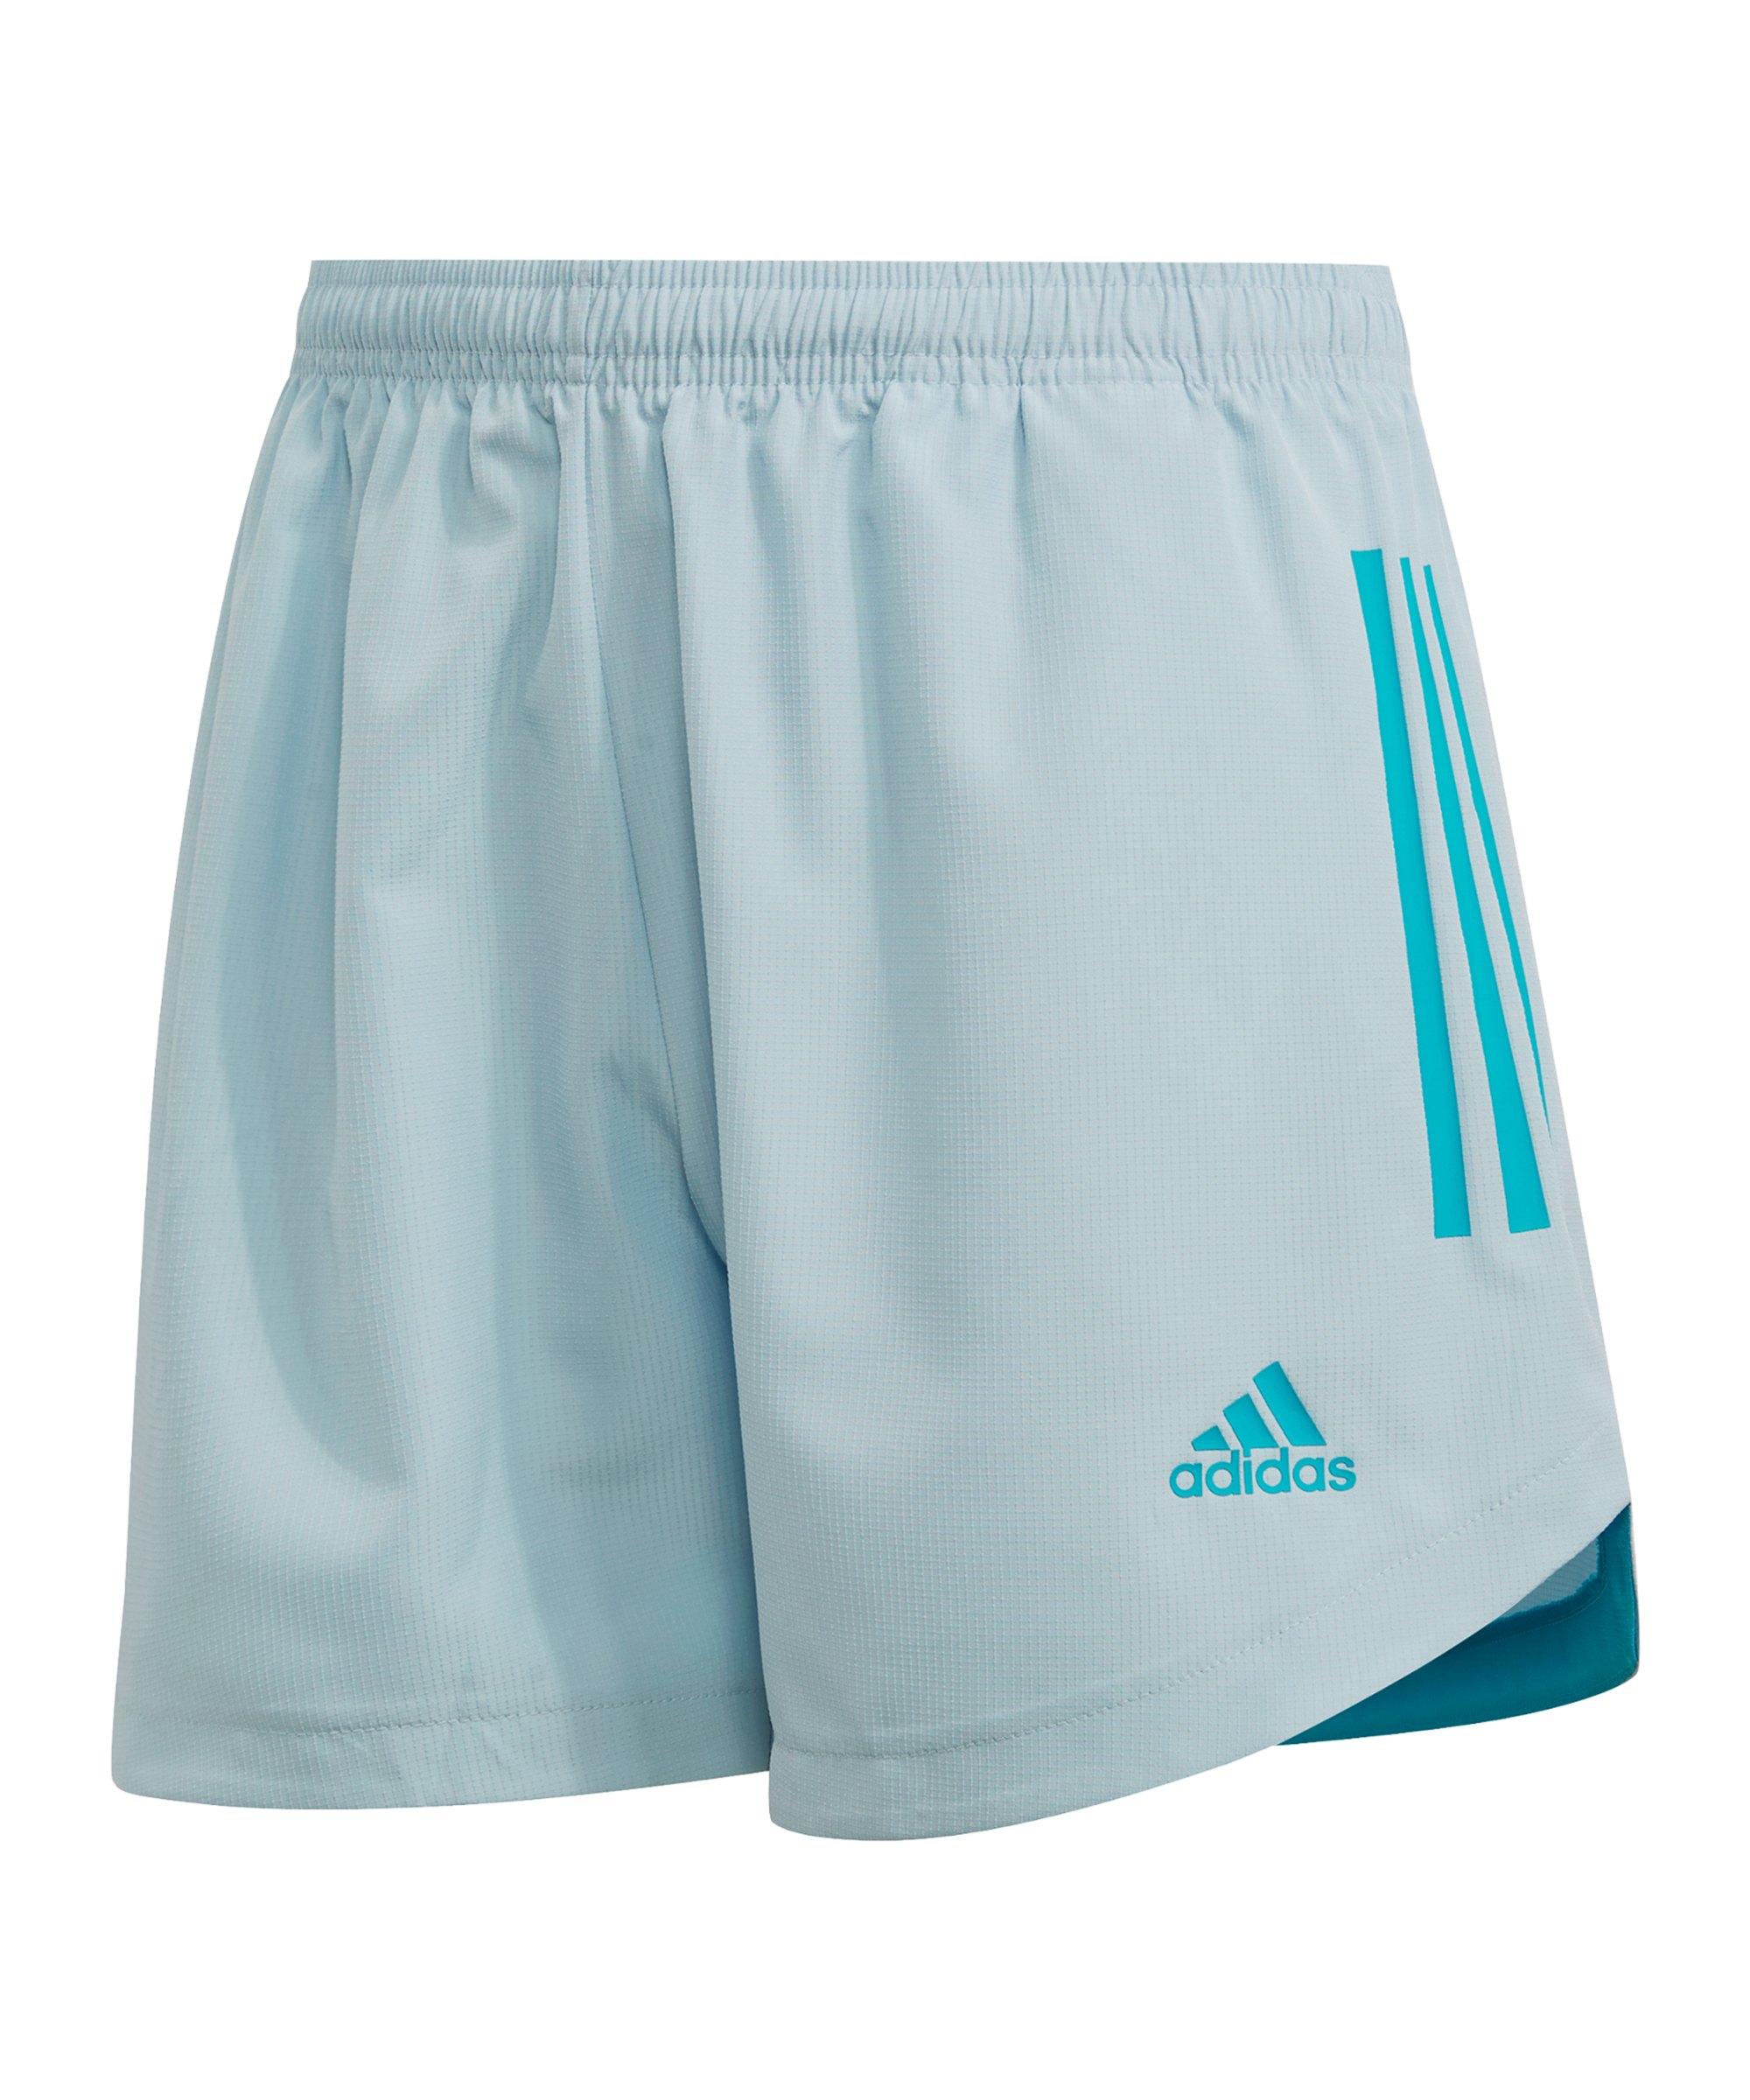 adidas Condivo 20 PB Short Damen Hellblau - blau